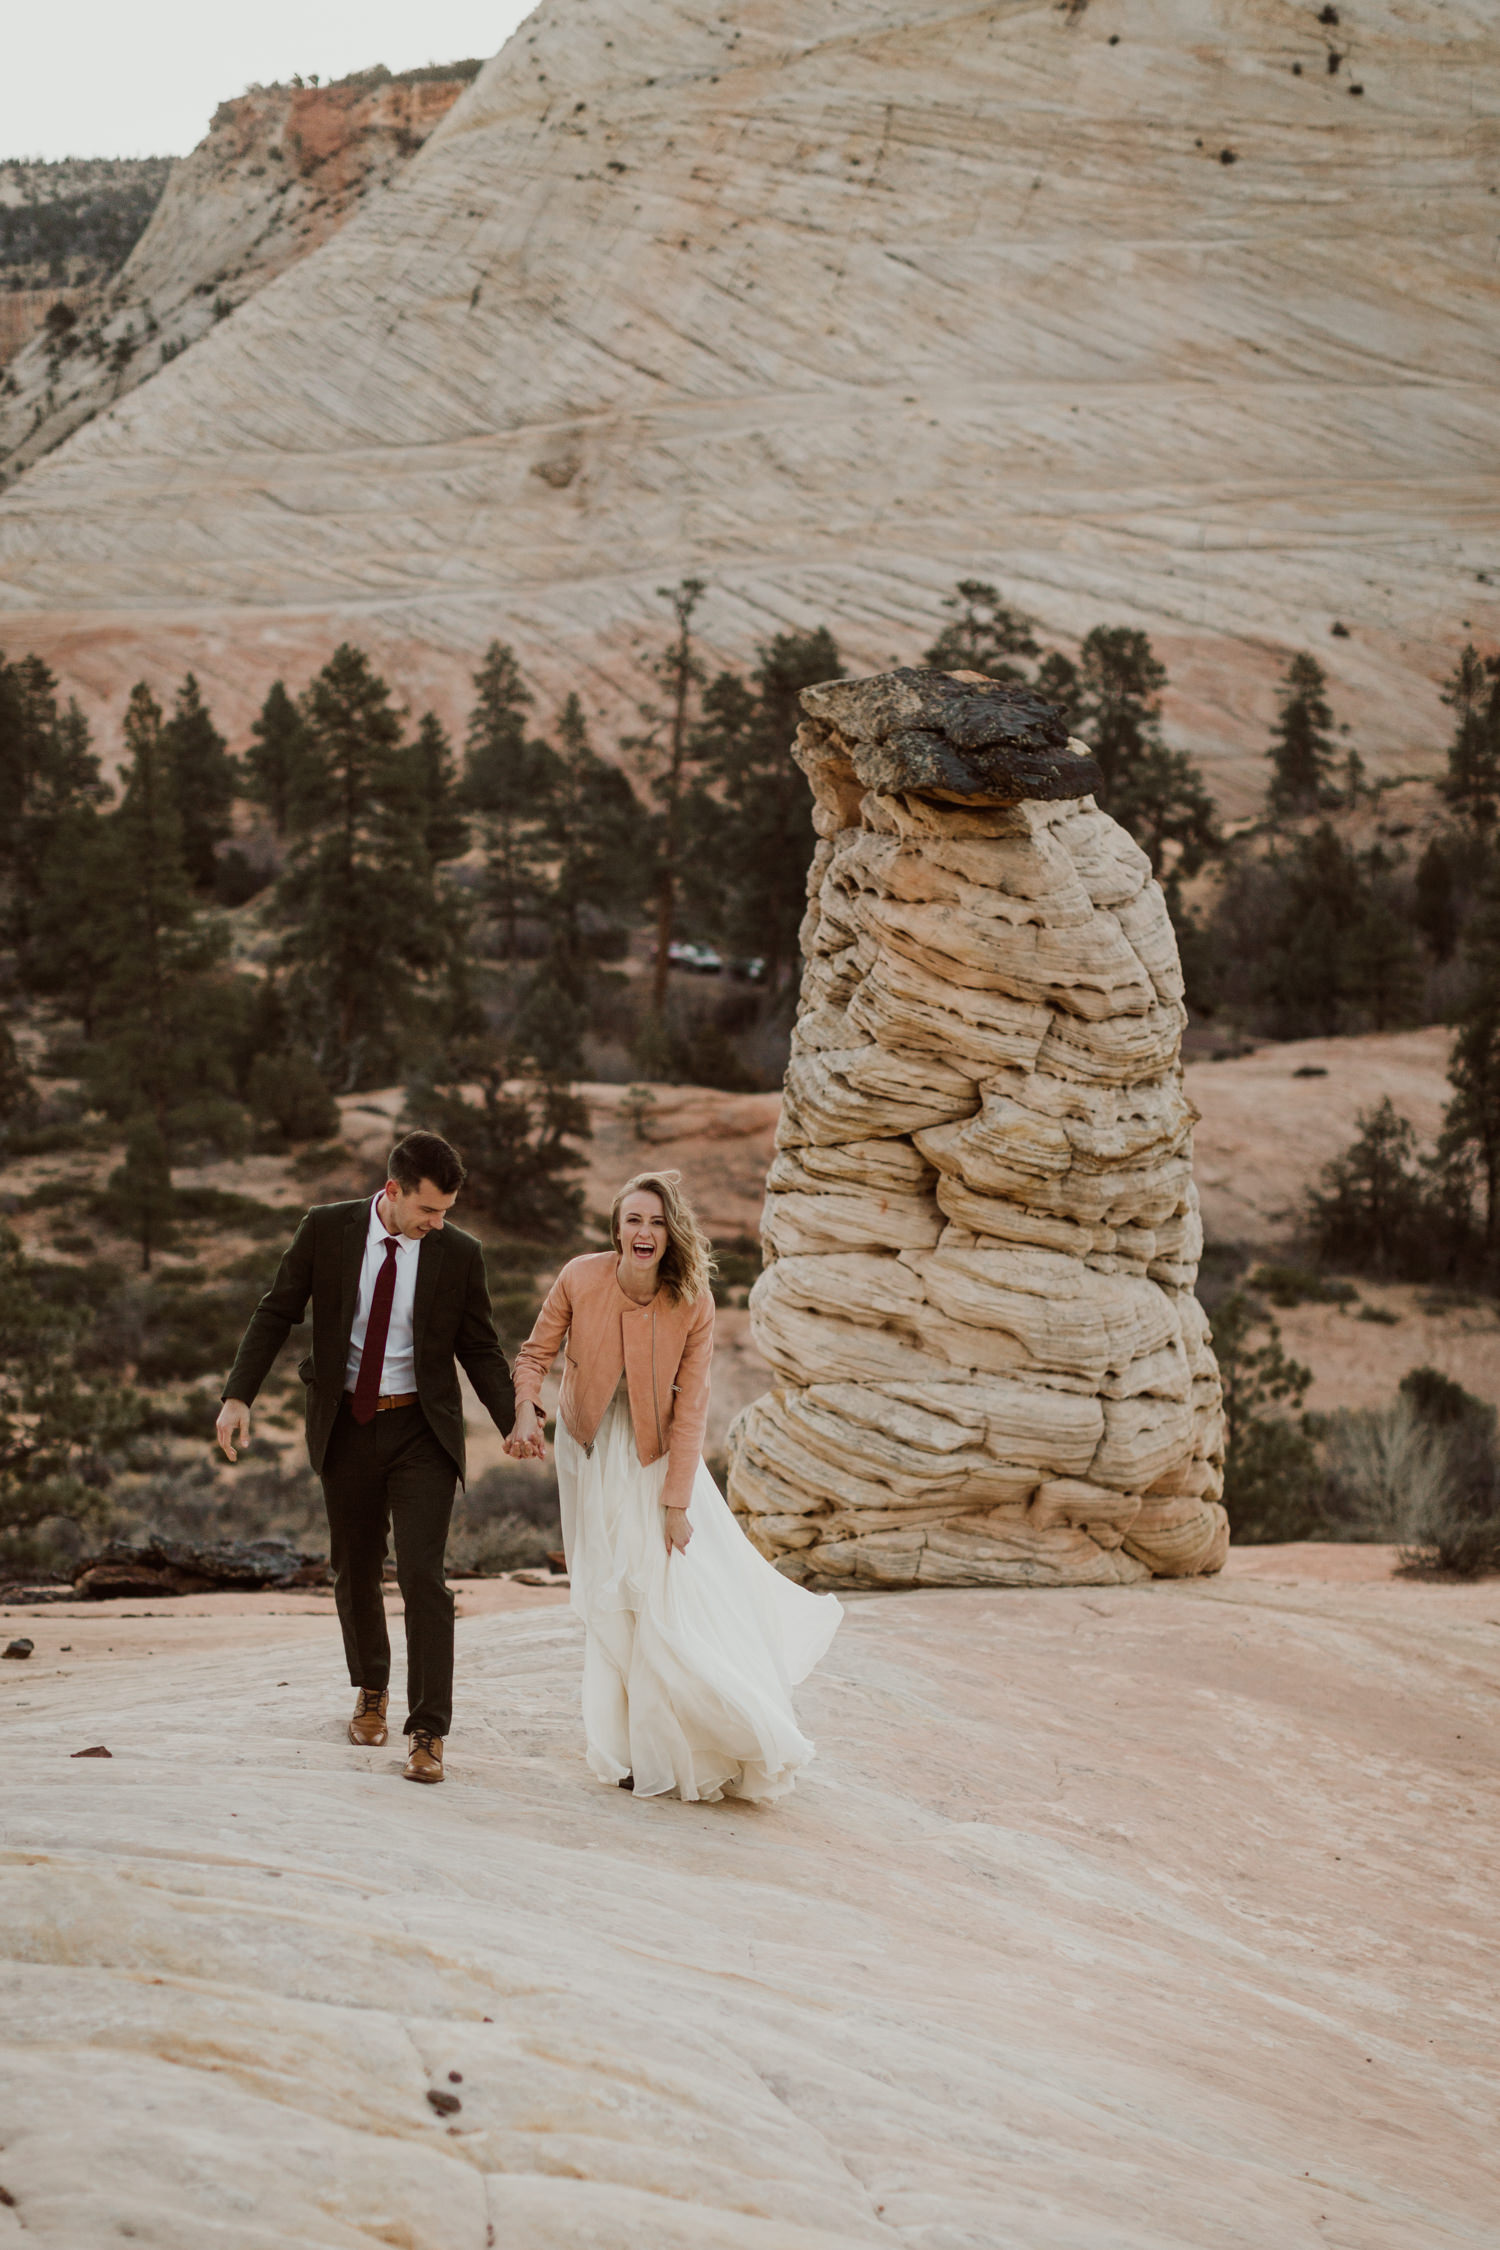 zion-national-park-wedding-38.jpg